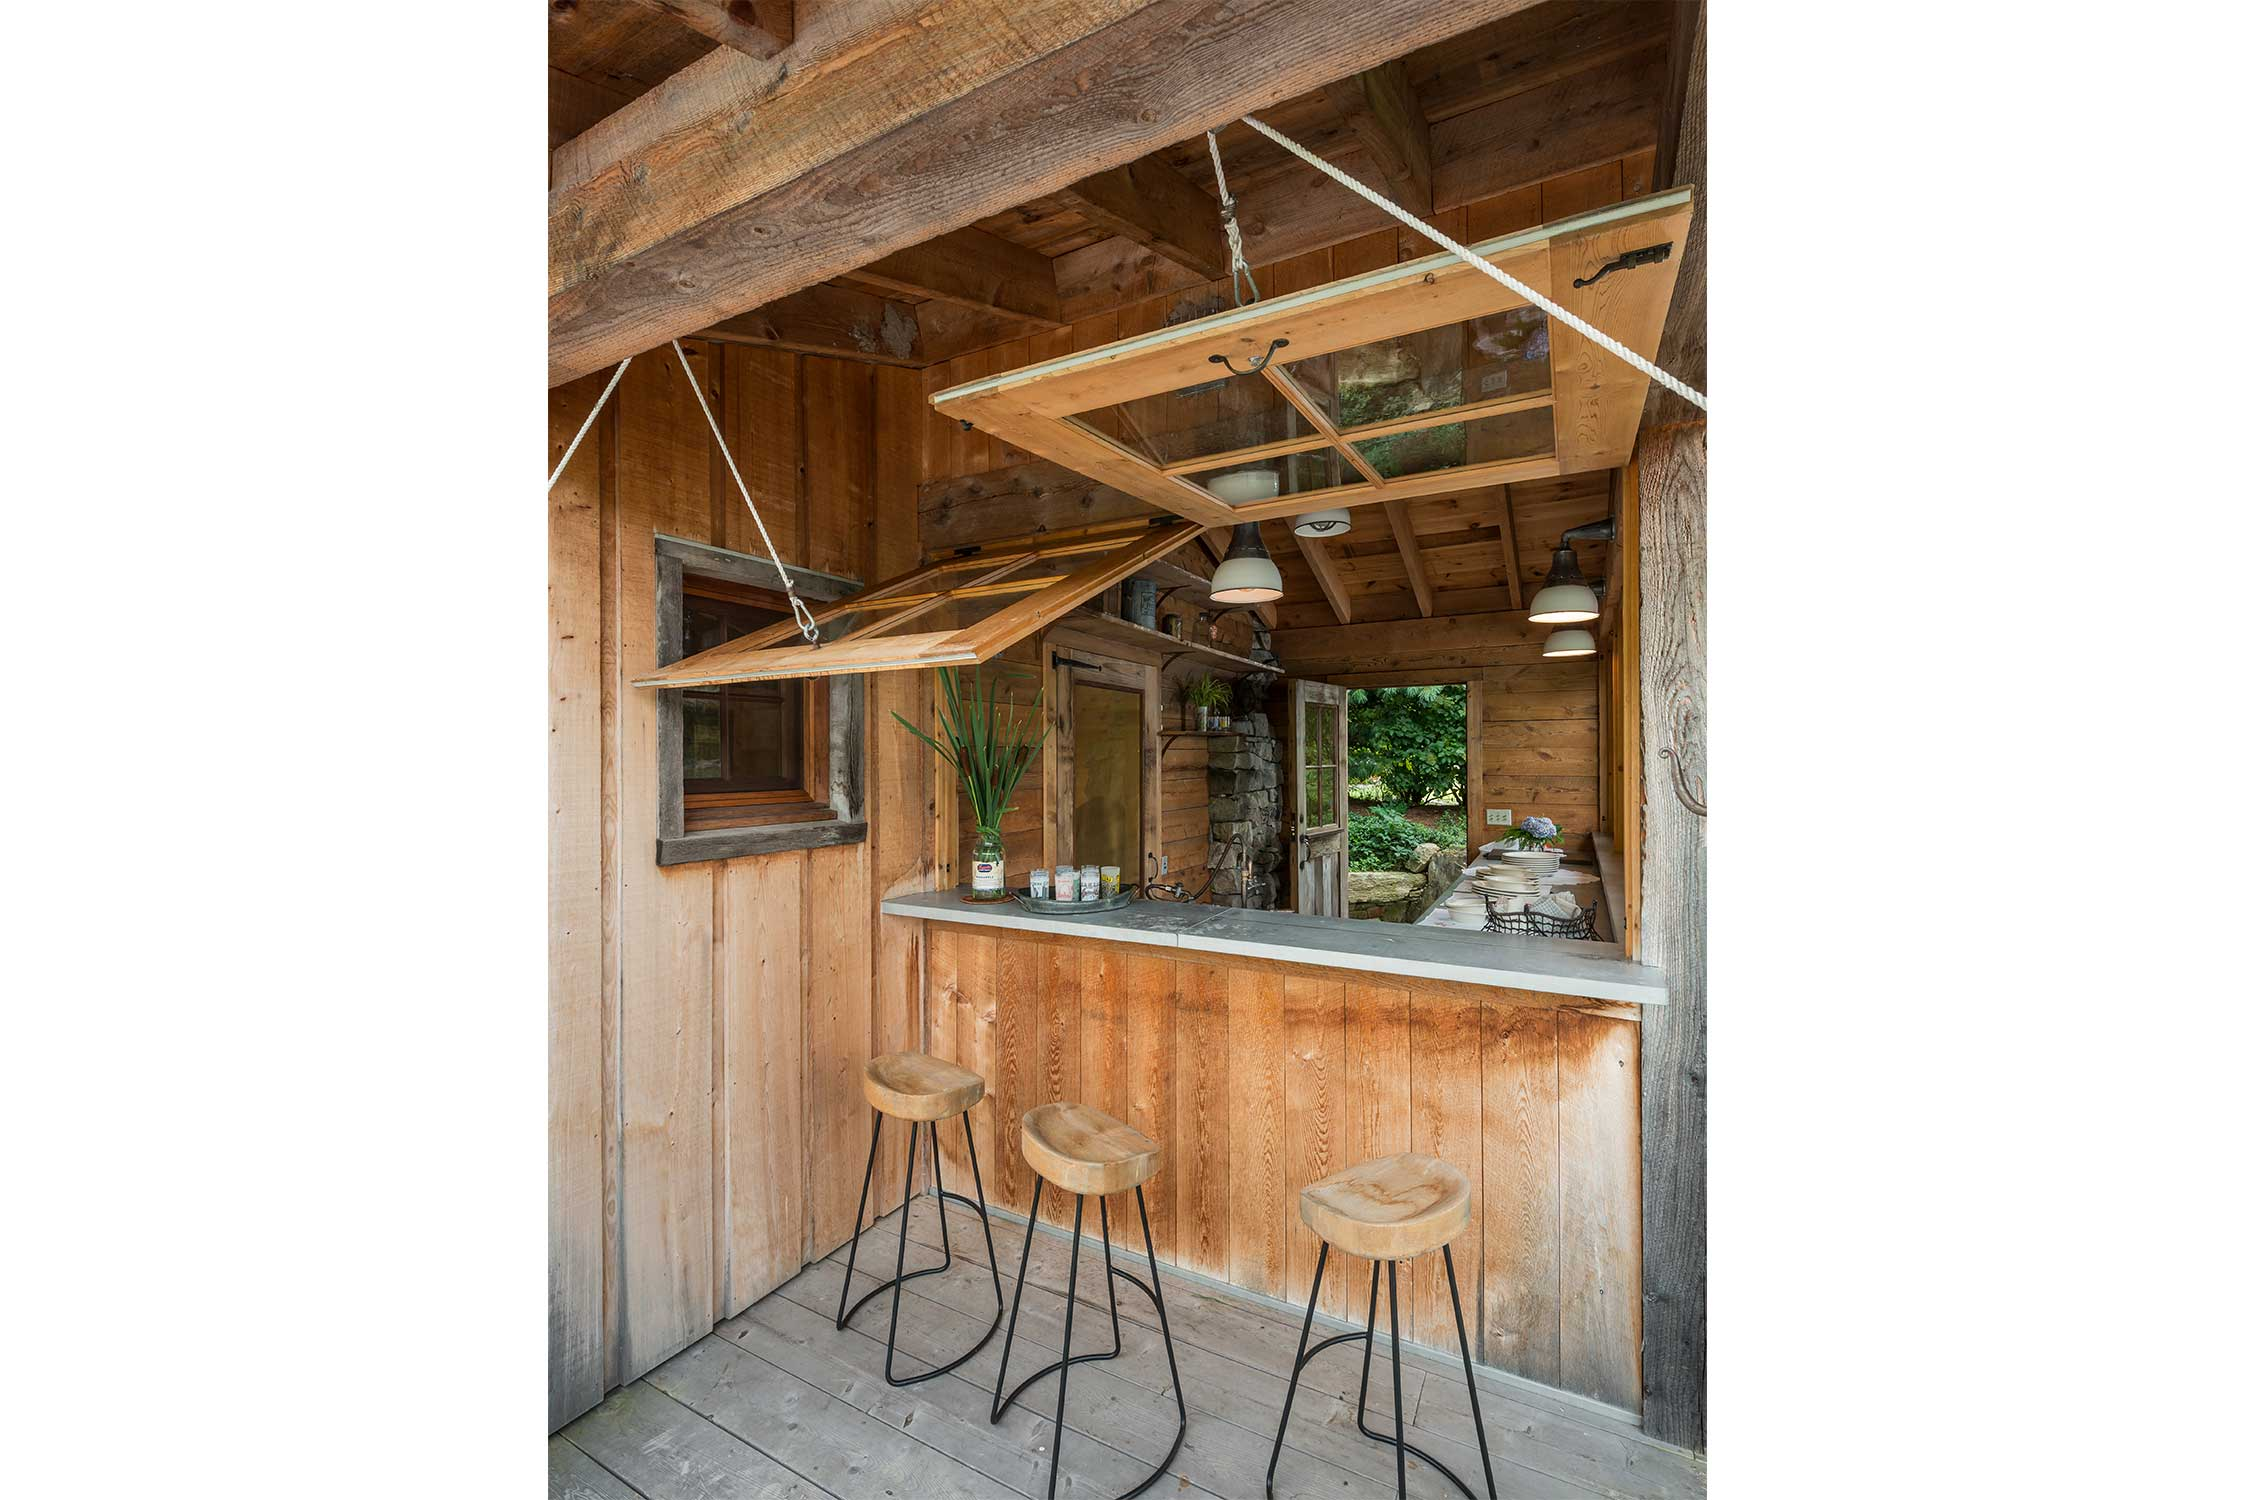 Bar like outdoor kitchen